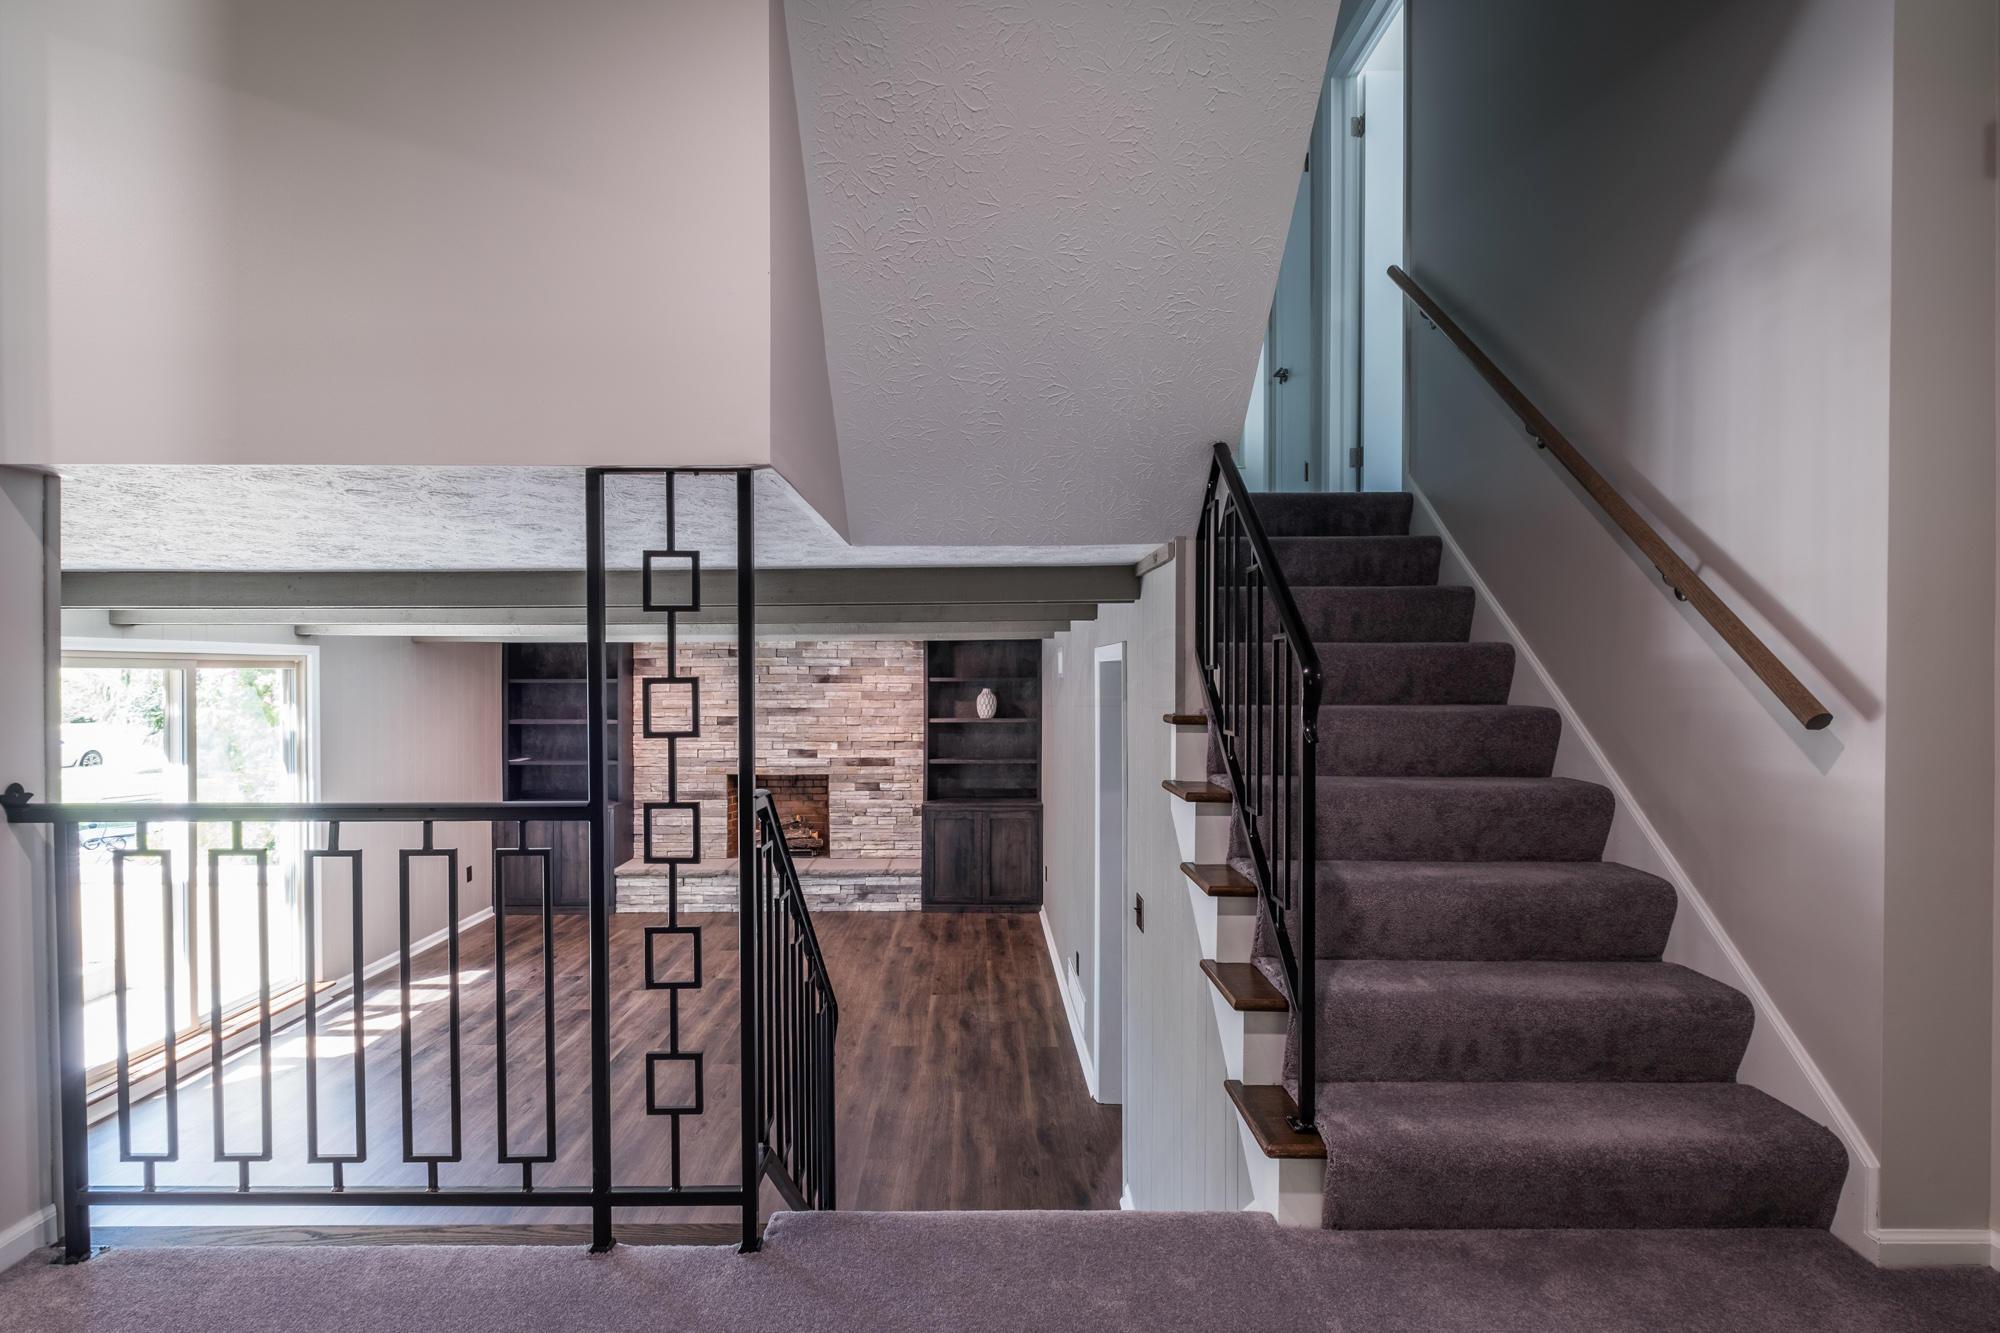 6985 Rieber Street, Worthington, Ohio 43085, 4 Bedrooms Bedrooms, ,3 BathroomsBathrooms,Residential,For Sale,Rieber,220031607